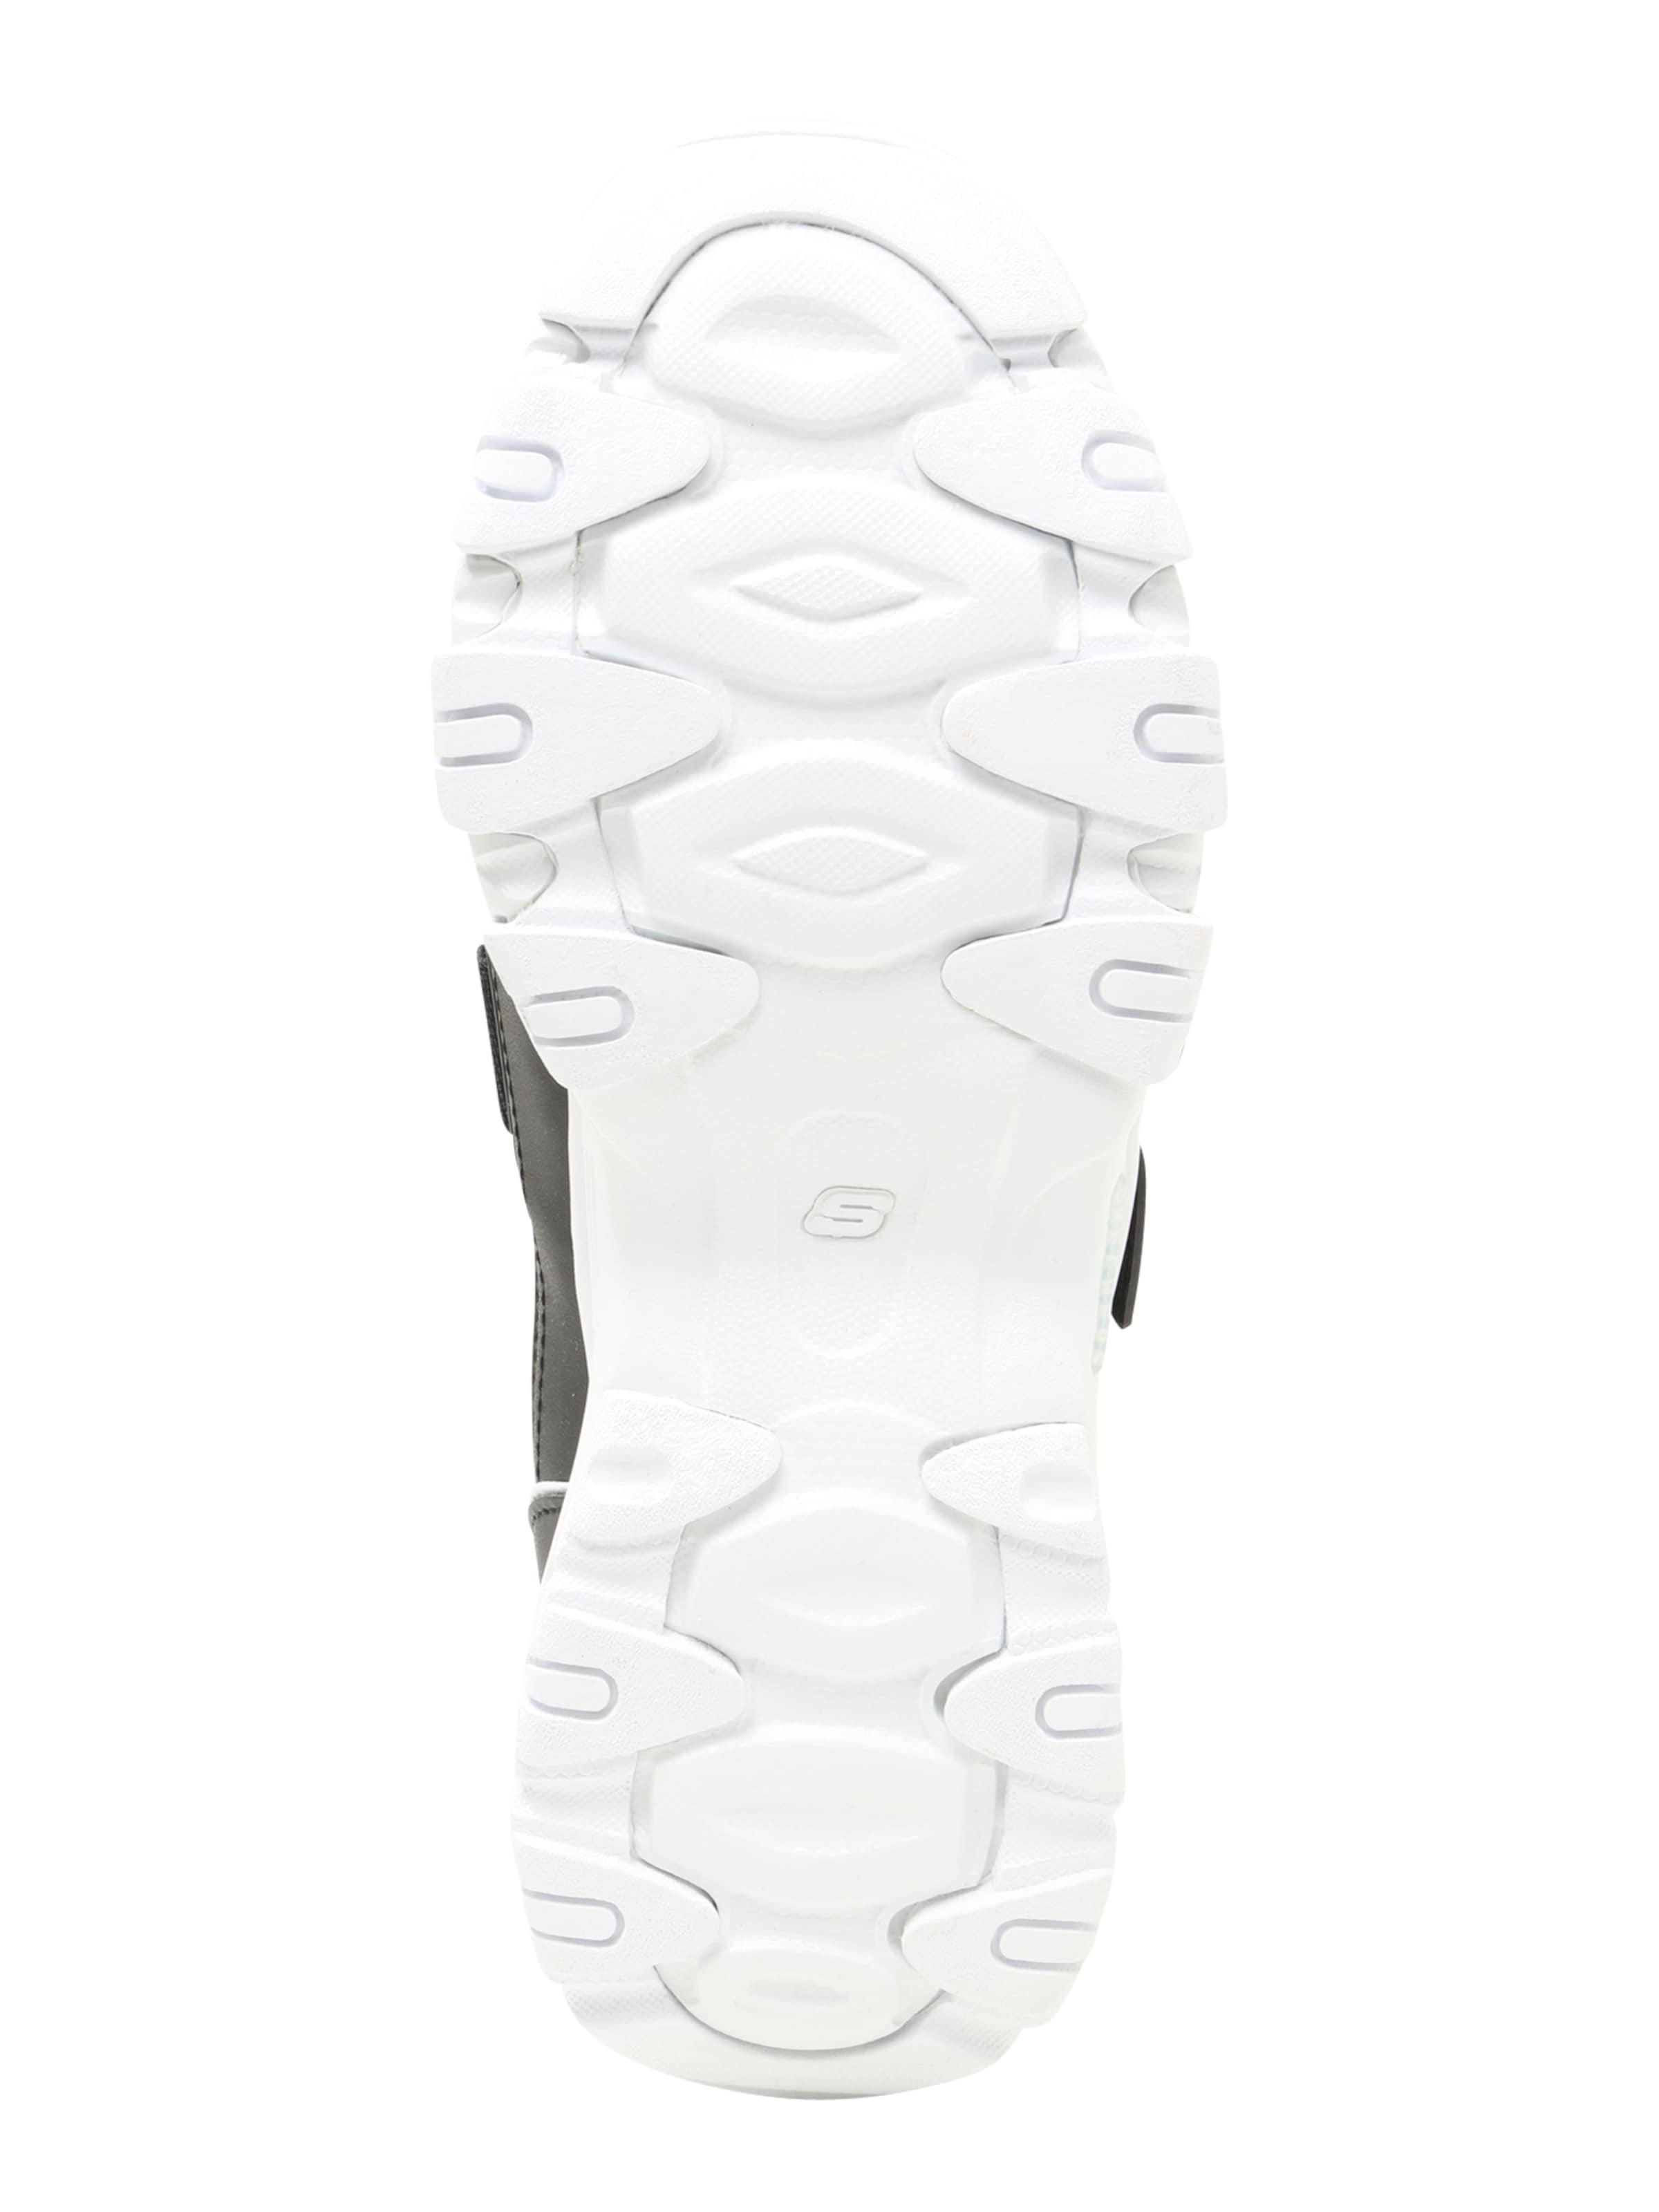 SKECHERS Sneaker 'D'LITES 2 - FAST LOOK' Billig Kaufen Authentisch bk6bFkasS